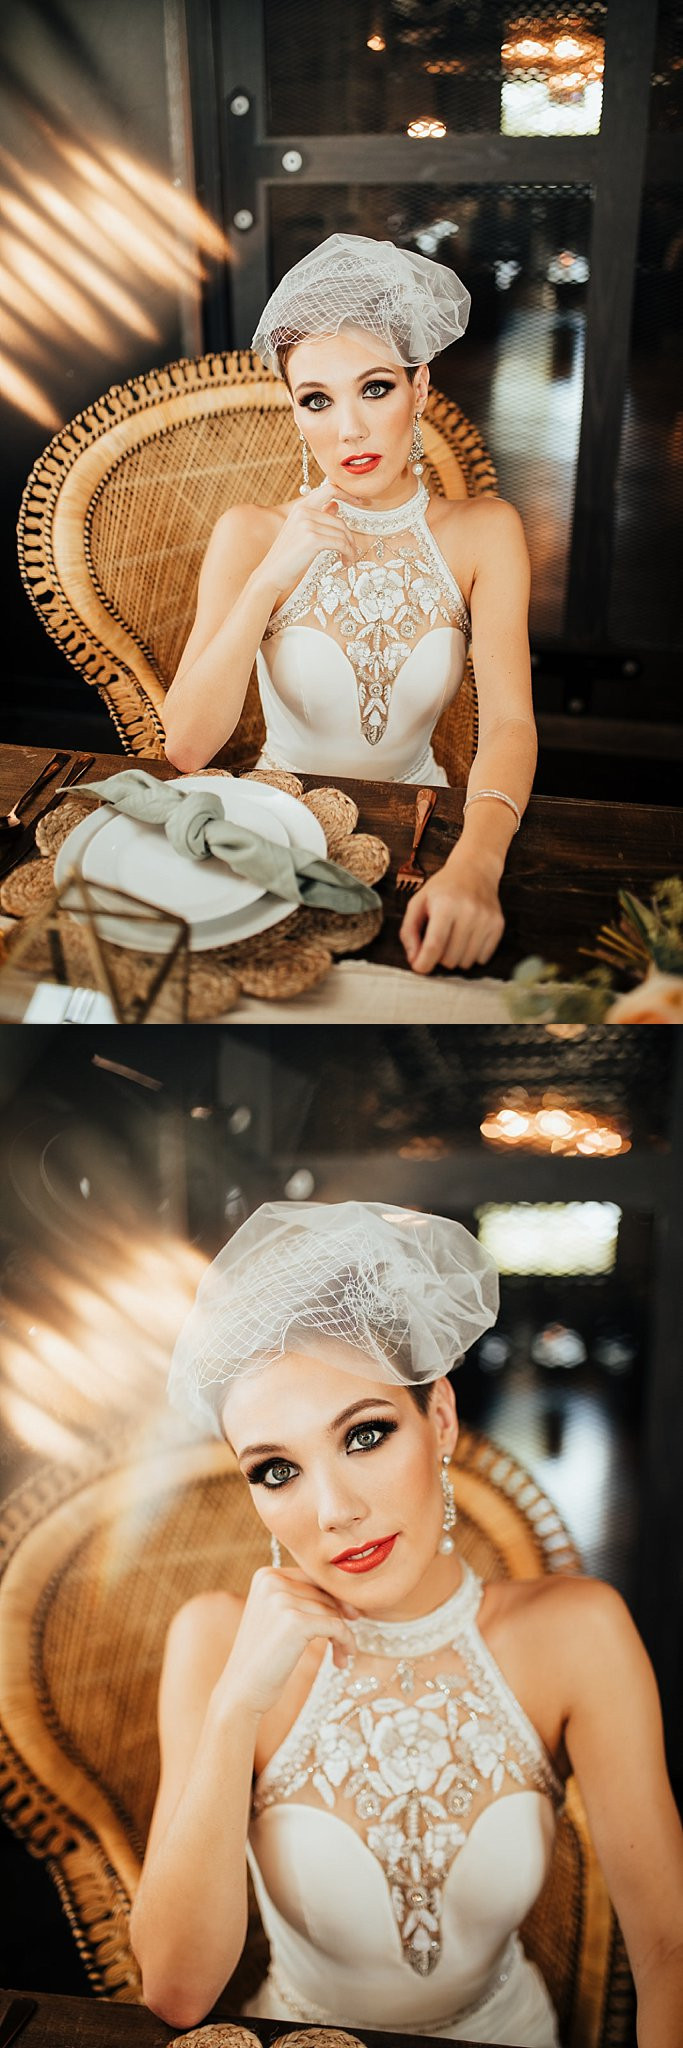 Boerne Wedding Photographer | Park 31 Wedding Photos | Bohemian Styled Shoot | The Camera Exchange Workshop in San Antonio | Tropical Wedding Floral Ideas | Boho and Tropical Styled Shoot | San Antonio Wedding | Boerne Photographer | Industrial Wedding